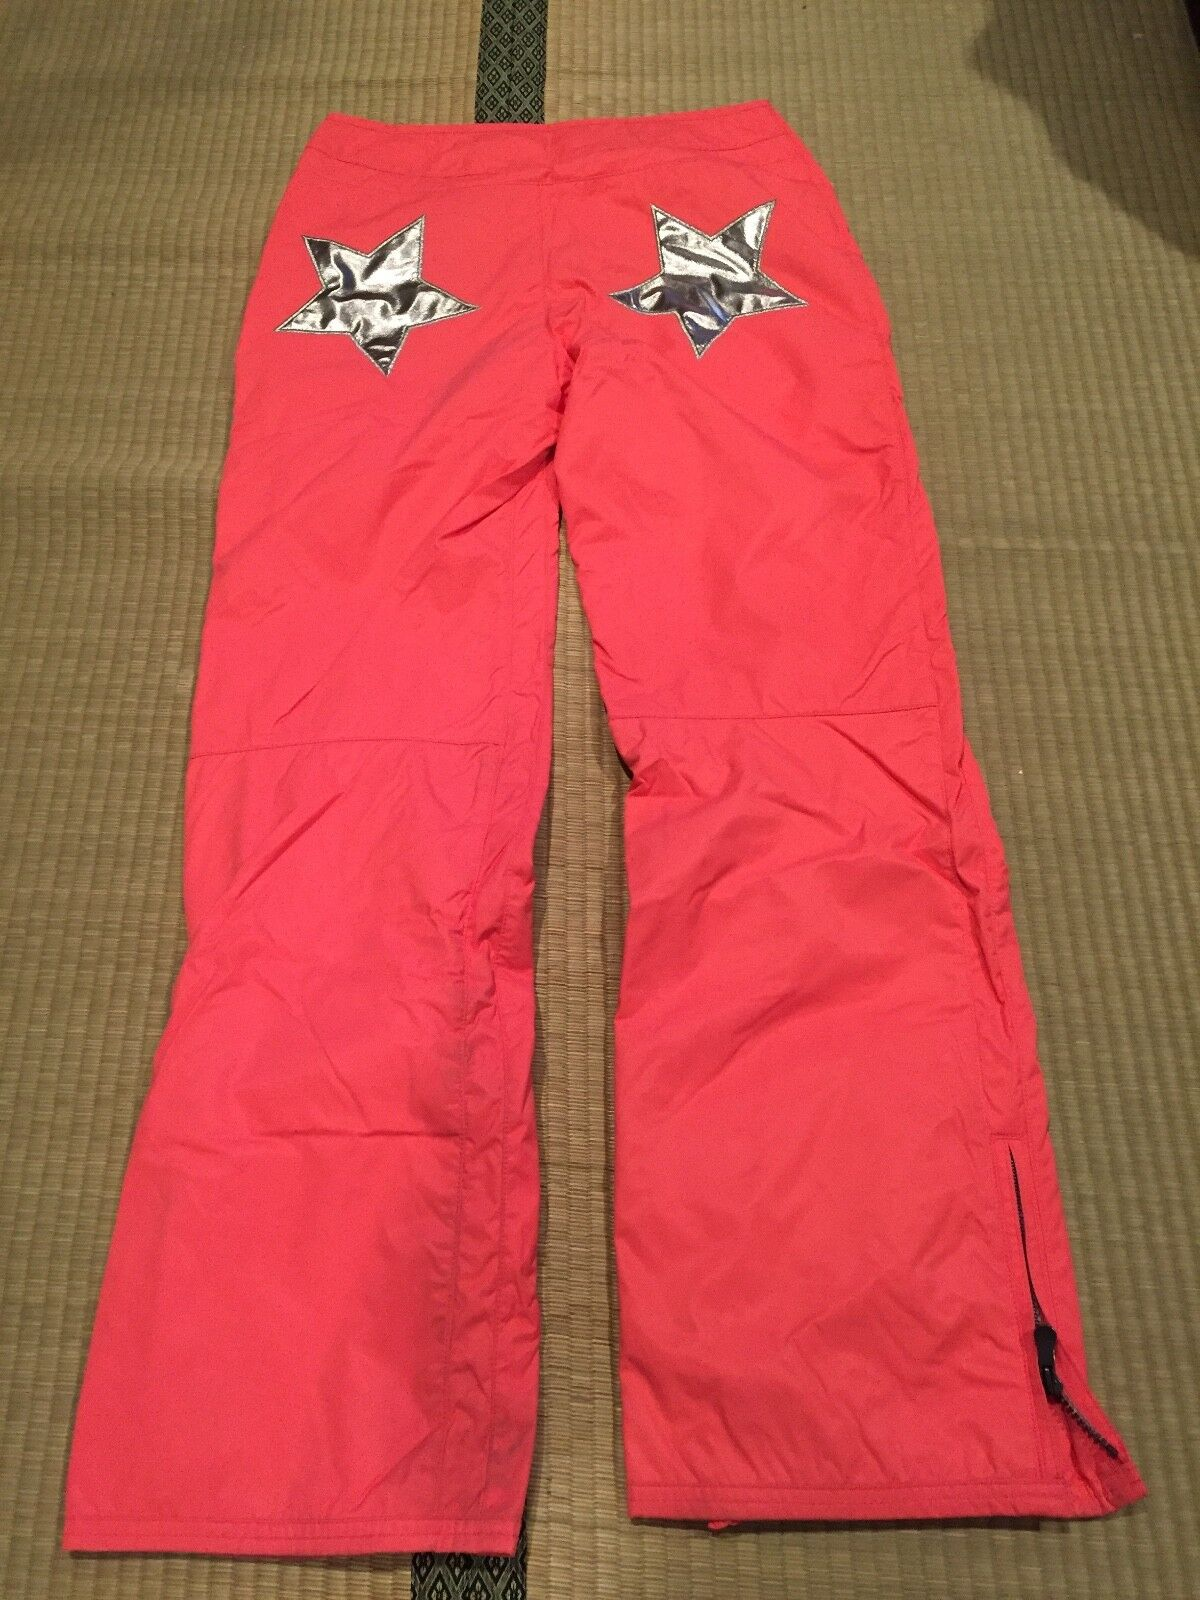 JS XTREME Ski Snow Winter Star Pants Size 1 need to fix